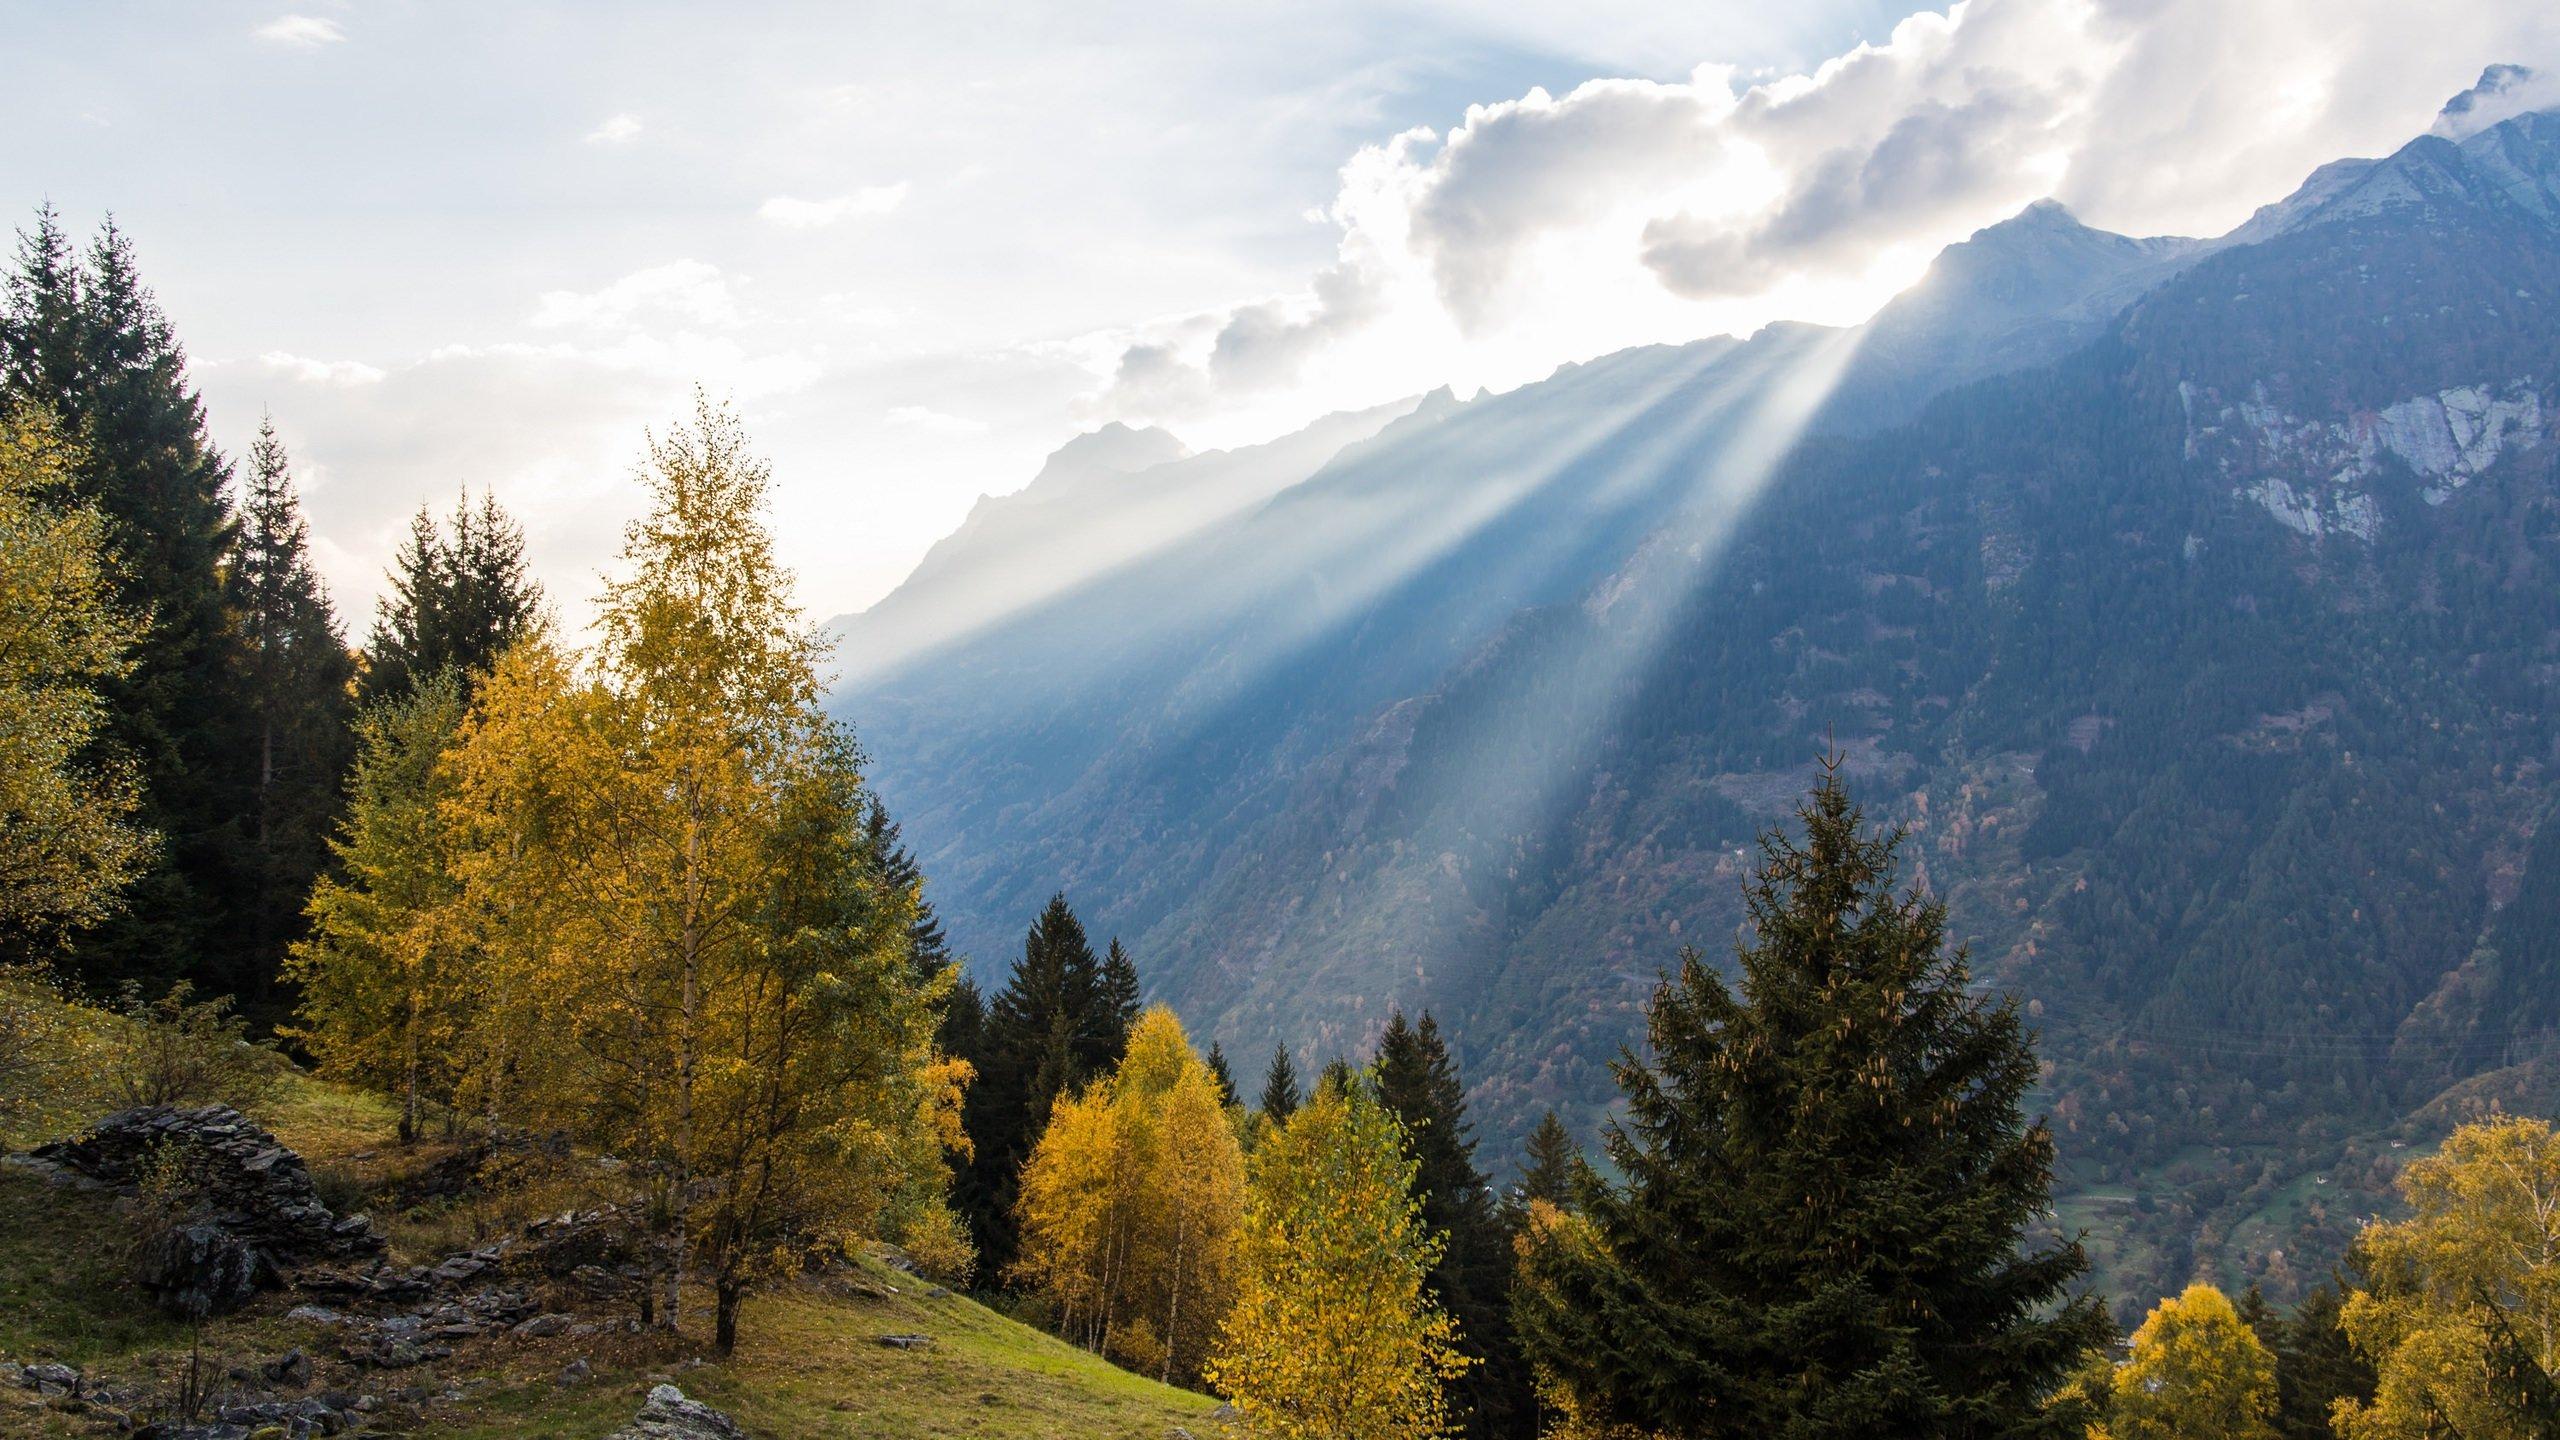 Fall In The Swiss Alps Hd Wallpaper